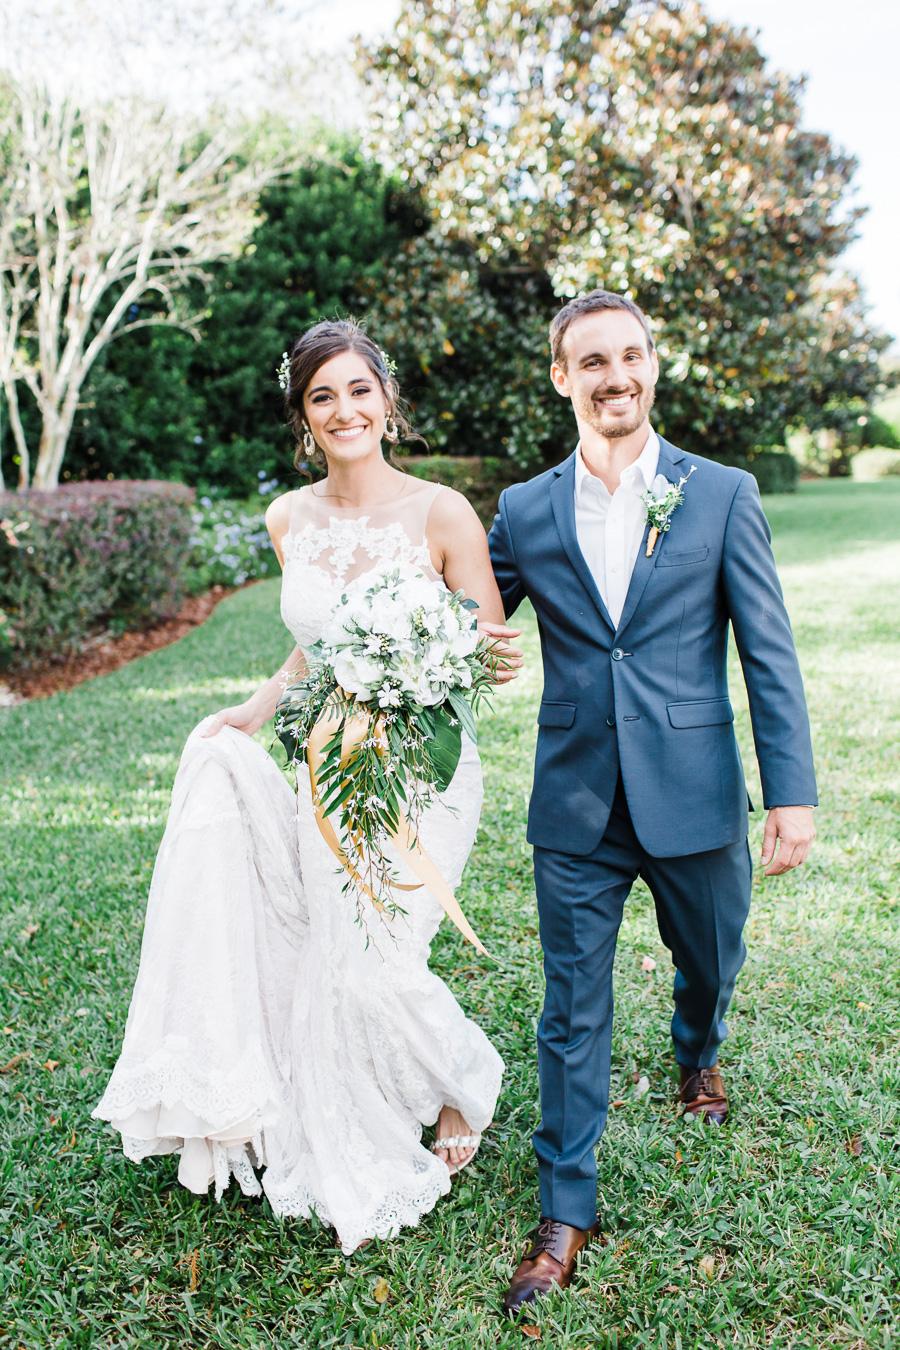 Wedding-photographer-orlando-44.jpg